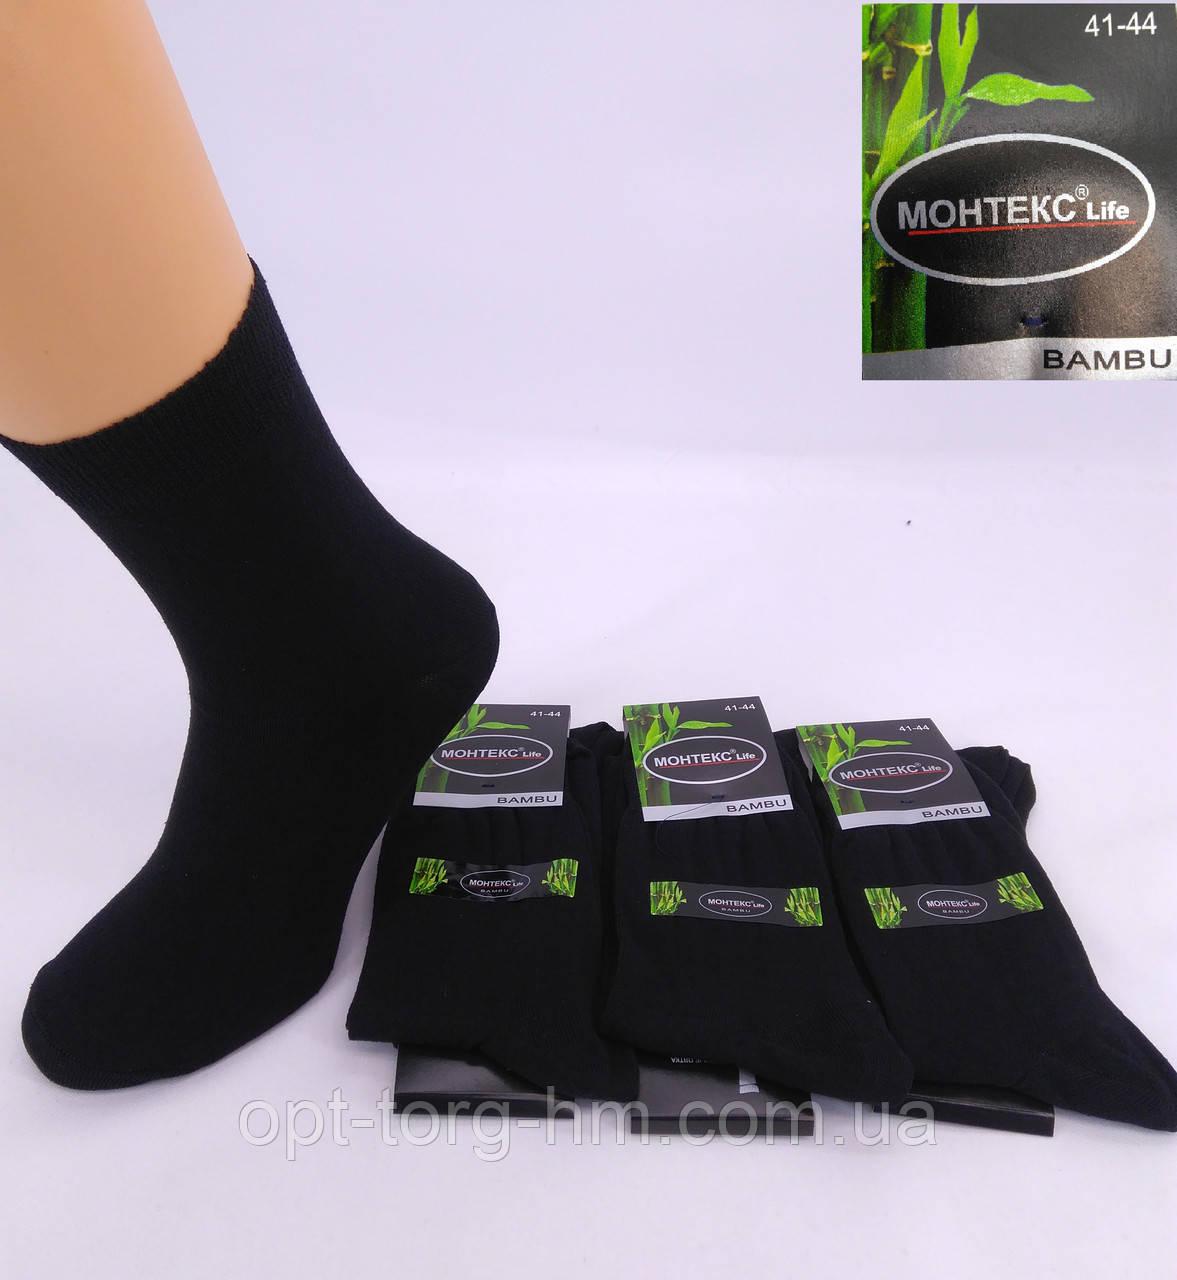 "Мужские носки ""Монтекс"" Bambu  (41-44обувь)"